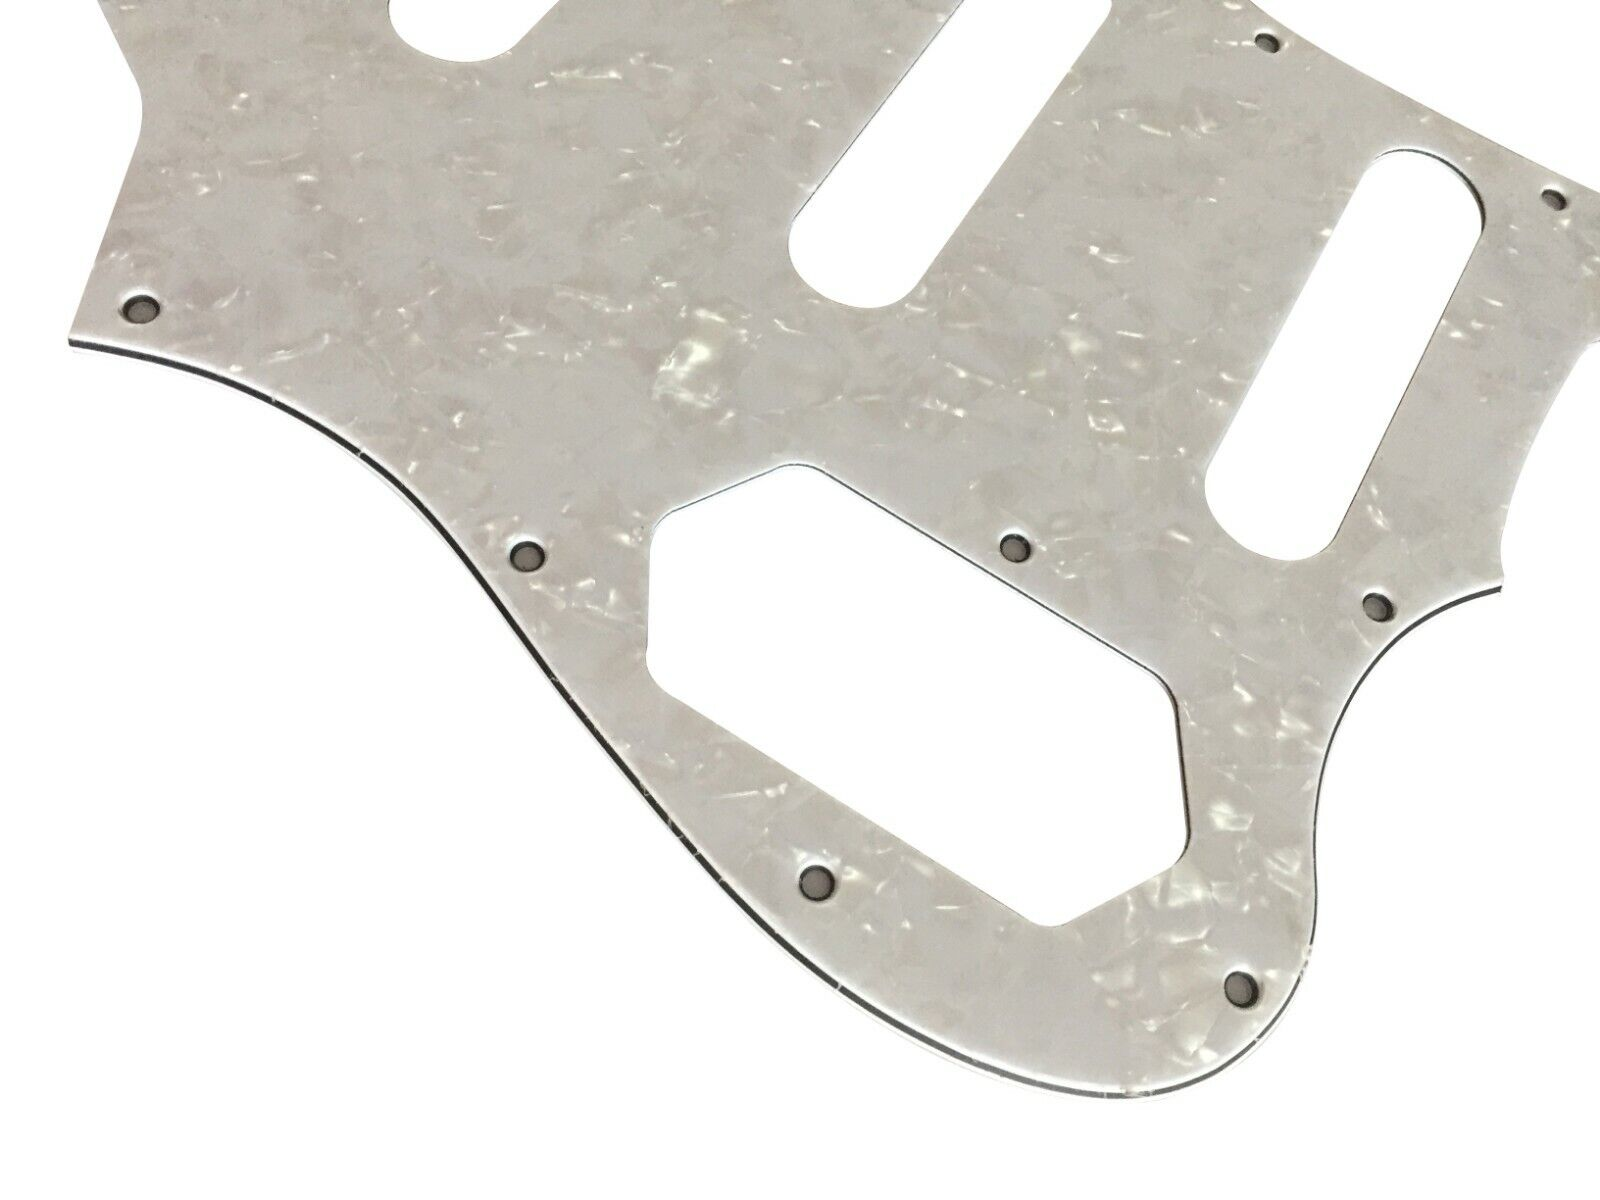 Custom 4 Ply White Pearl Squier Vintage Modified Bass VI Guitar Pickguard - $11.20